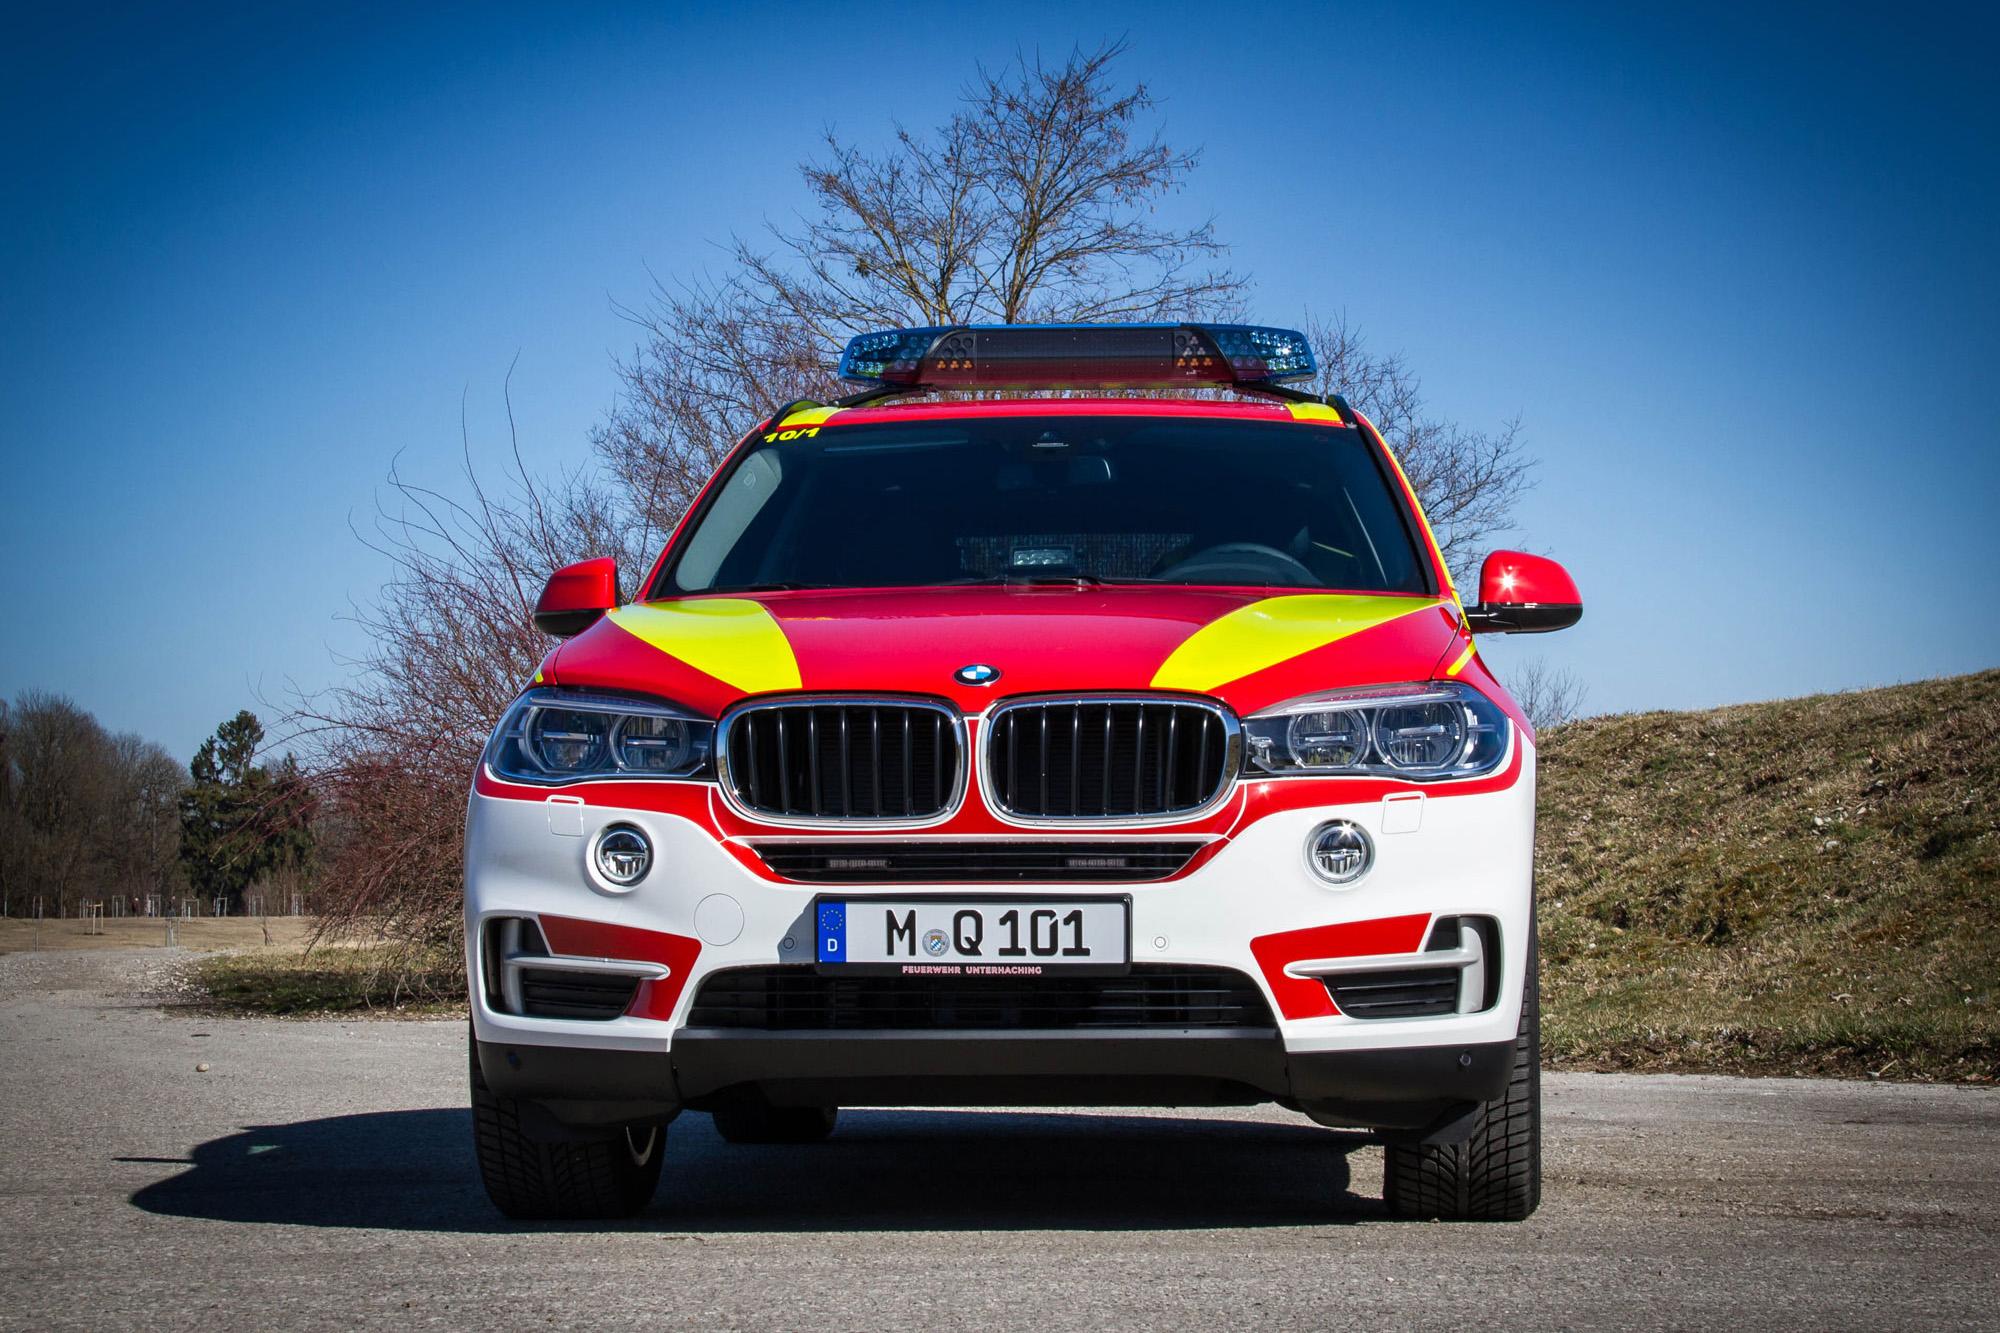 Florian Unterhaching 10/1 - BMW X5 xDrive30d - Baujahr 2017